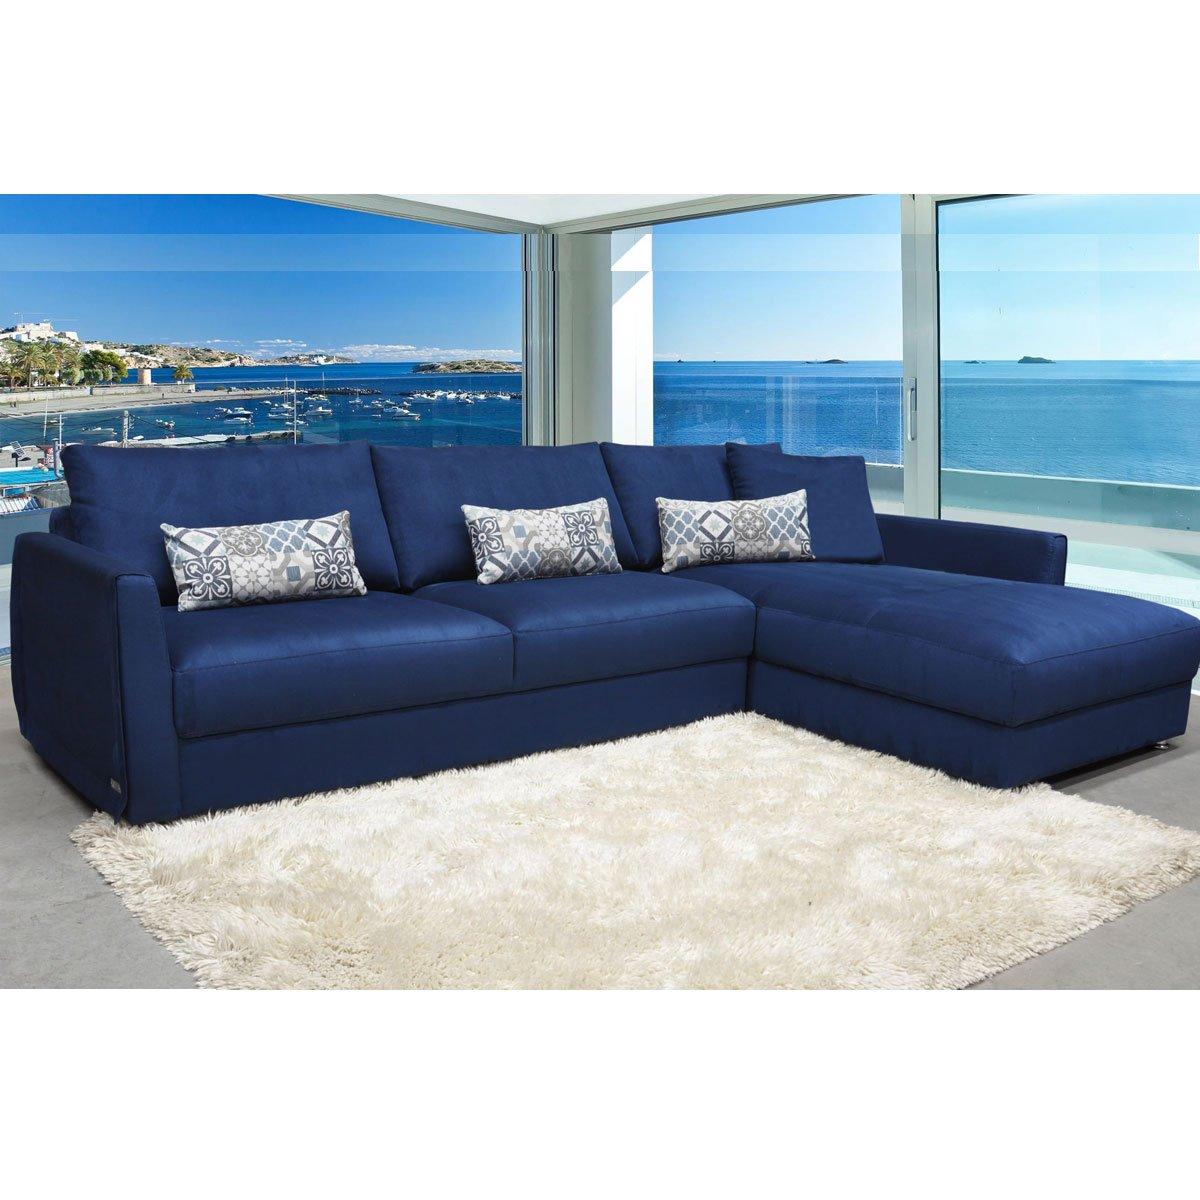 Sala Modular Sienna Izquierda Tela Azul Muebles Liz Sears Com Mx  # Muebles Liz Sears